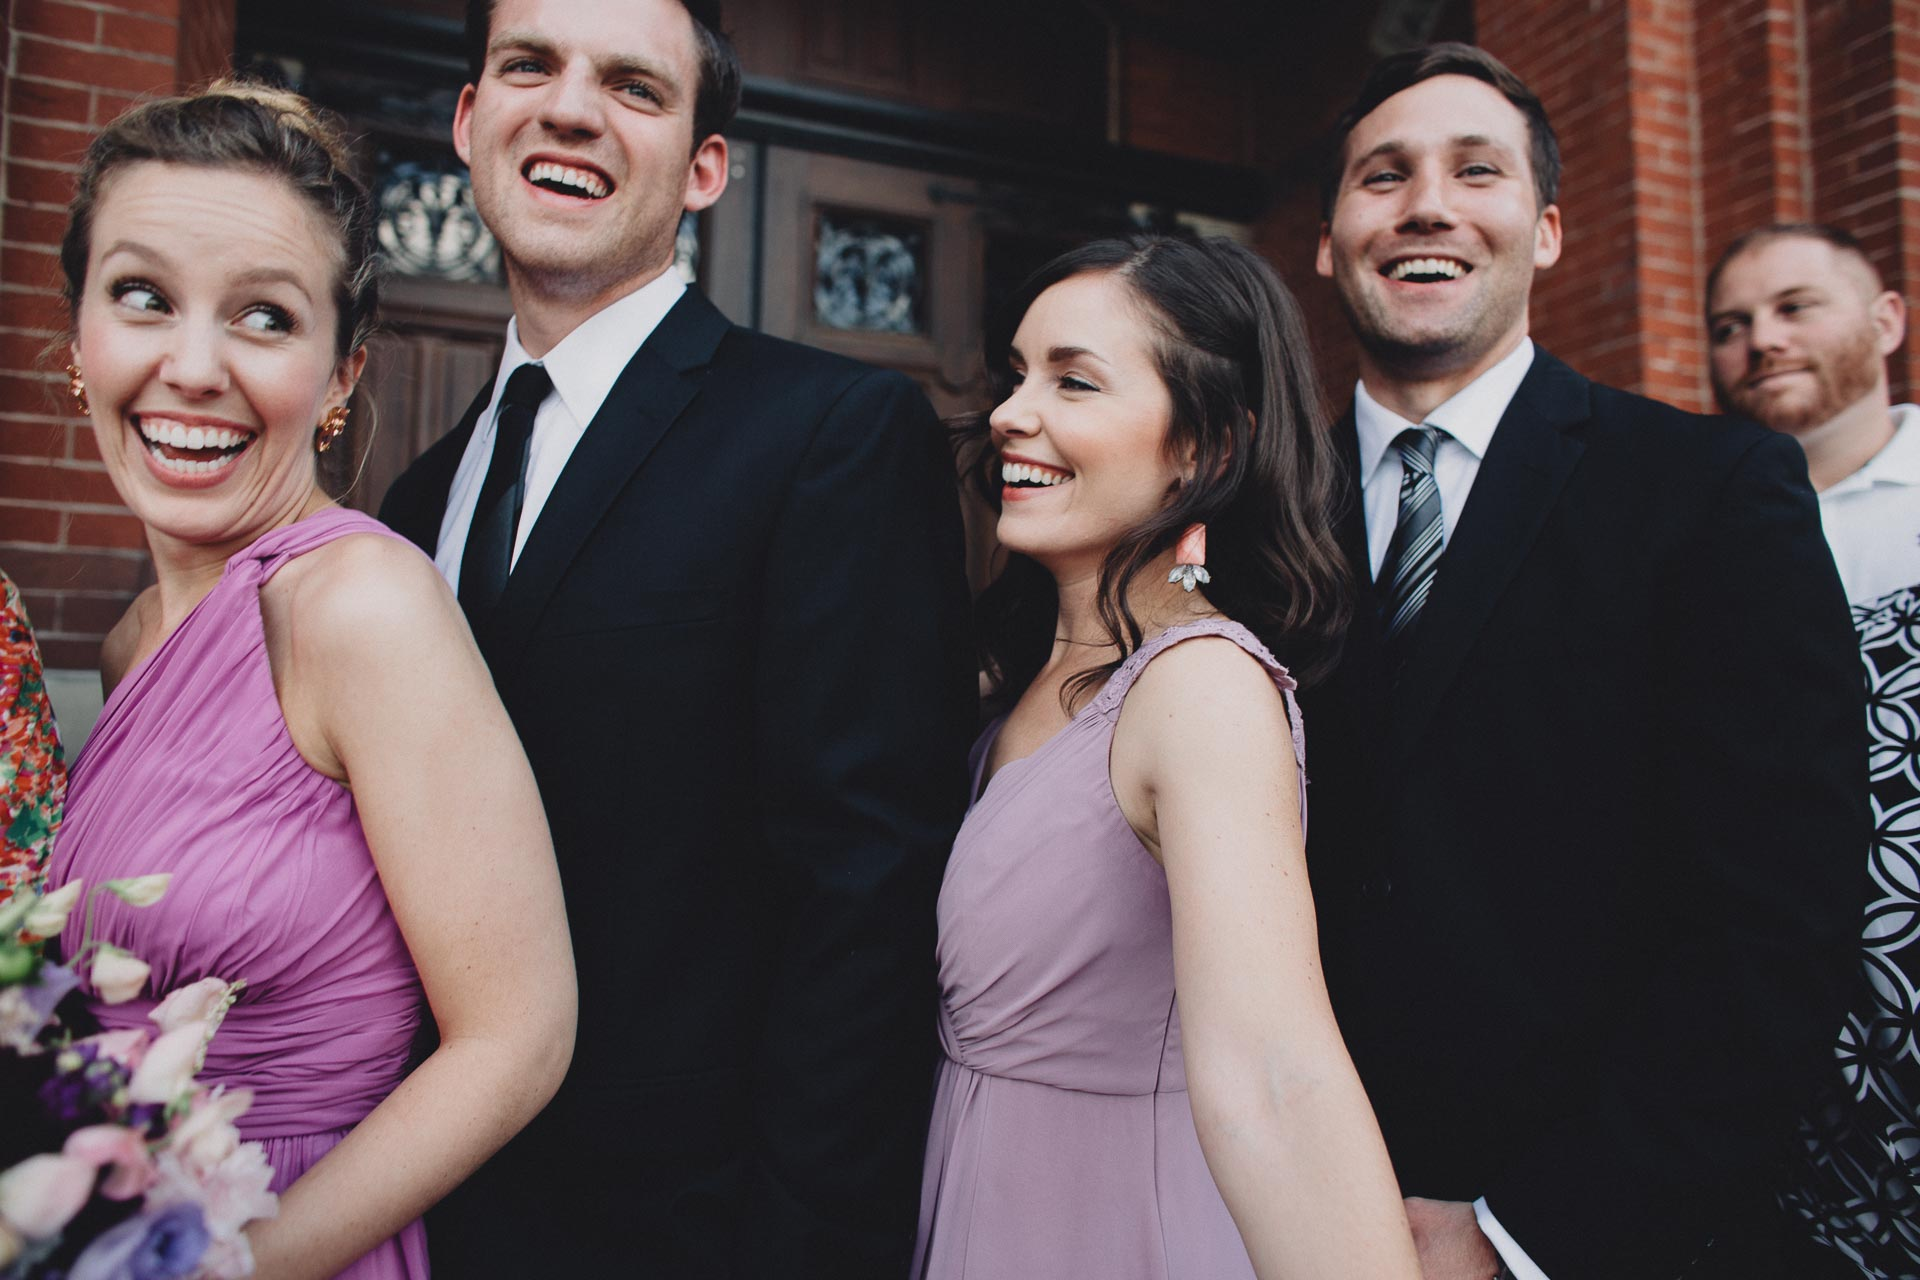 Julia-Michael-Cincinnati-Music-Hall-Wedding-085@2x.jpg